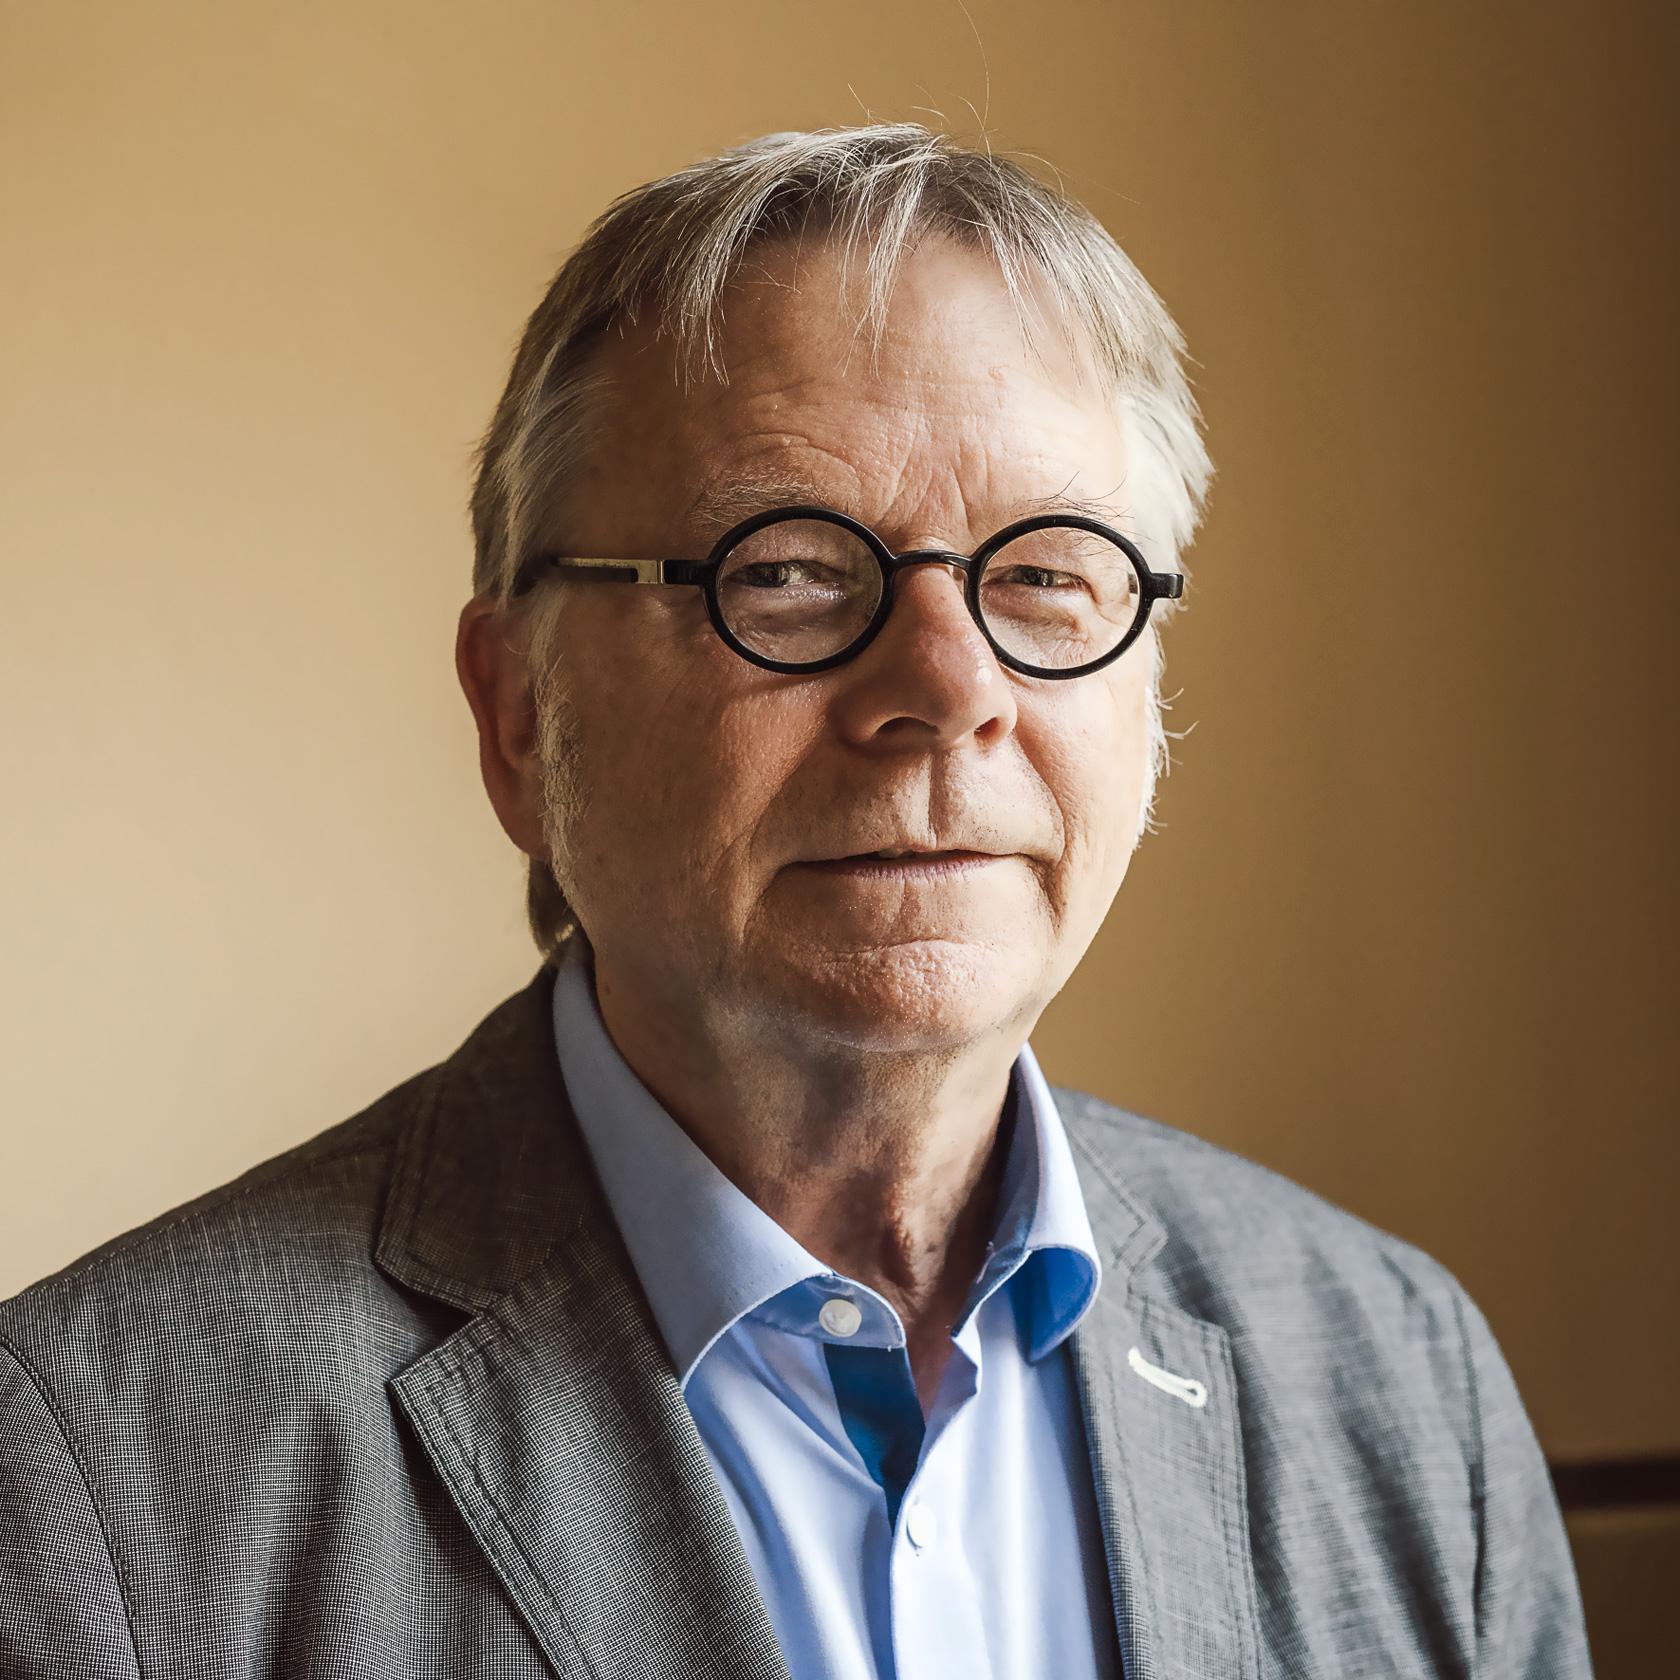 Prof. Dr. Martin Gertler